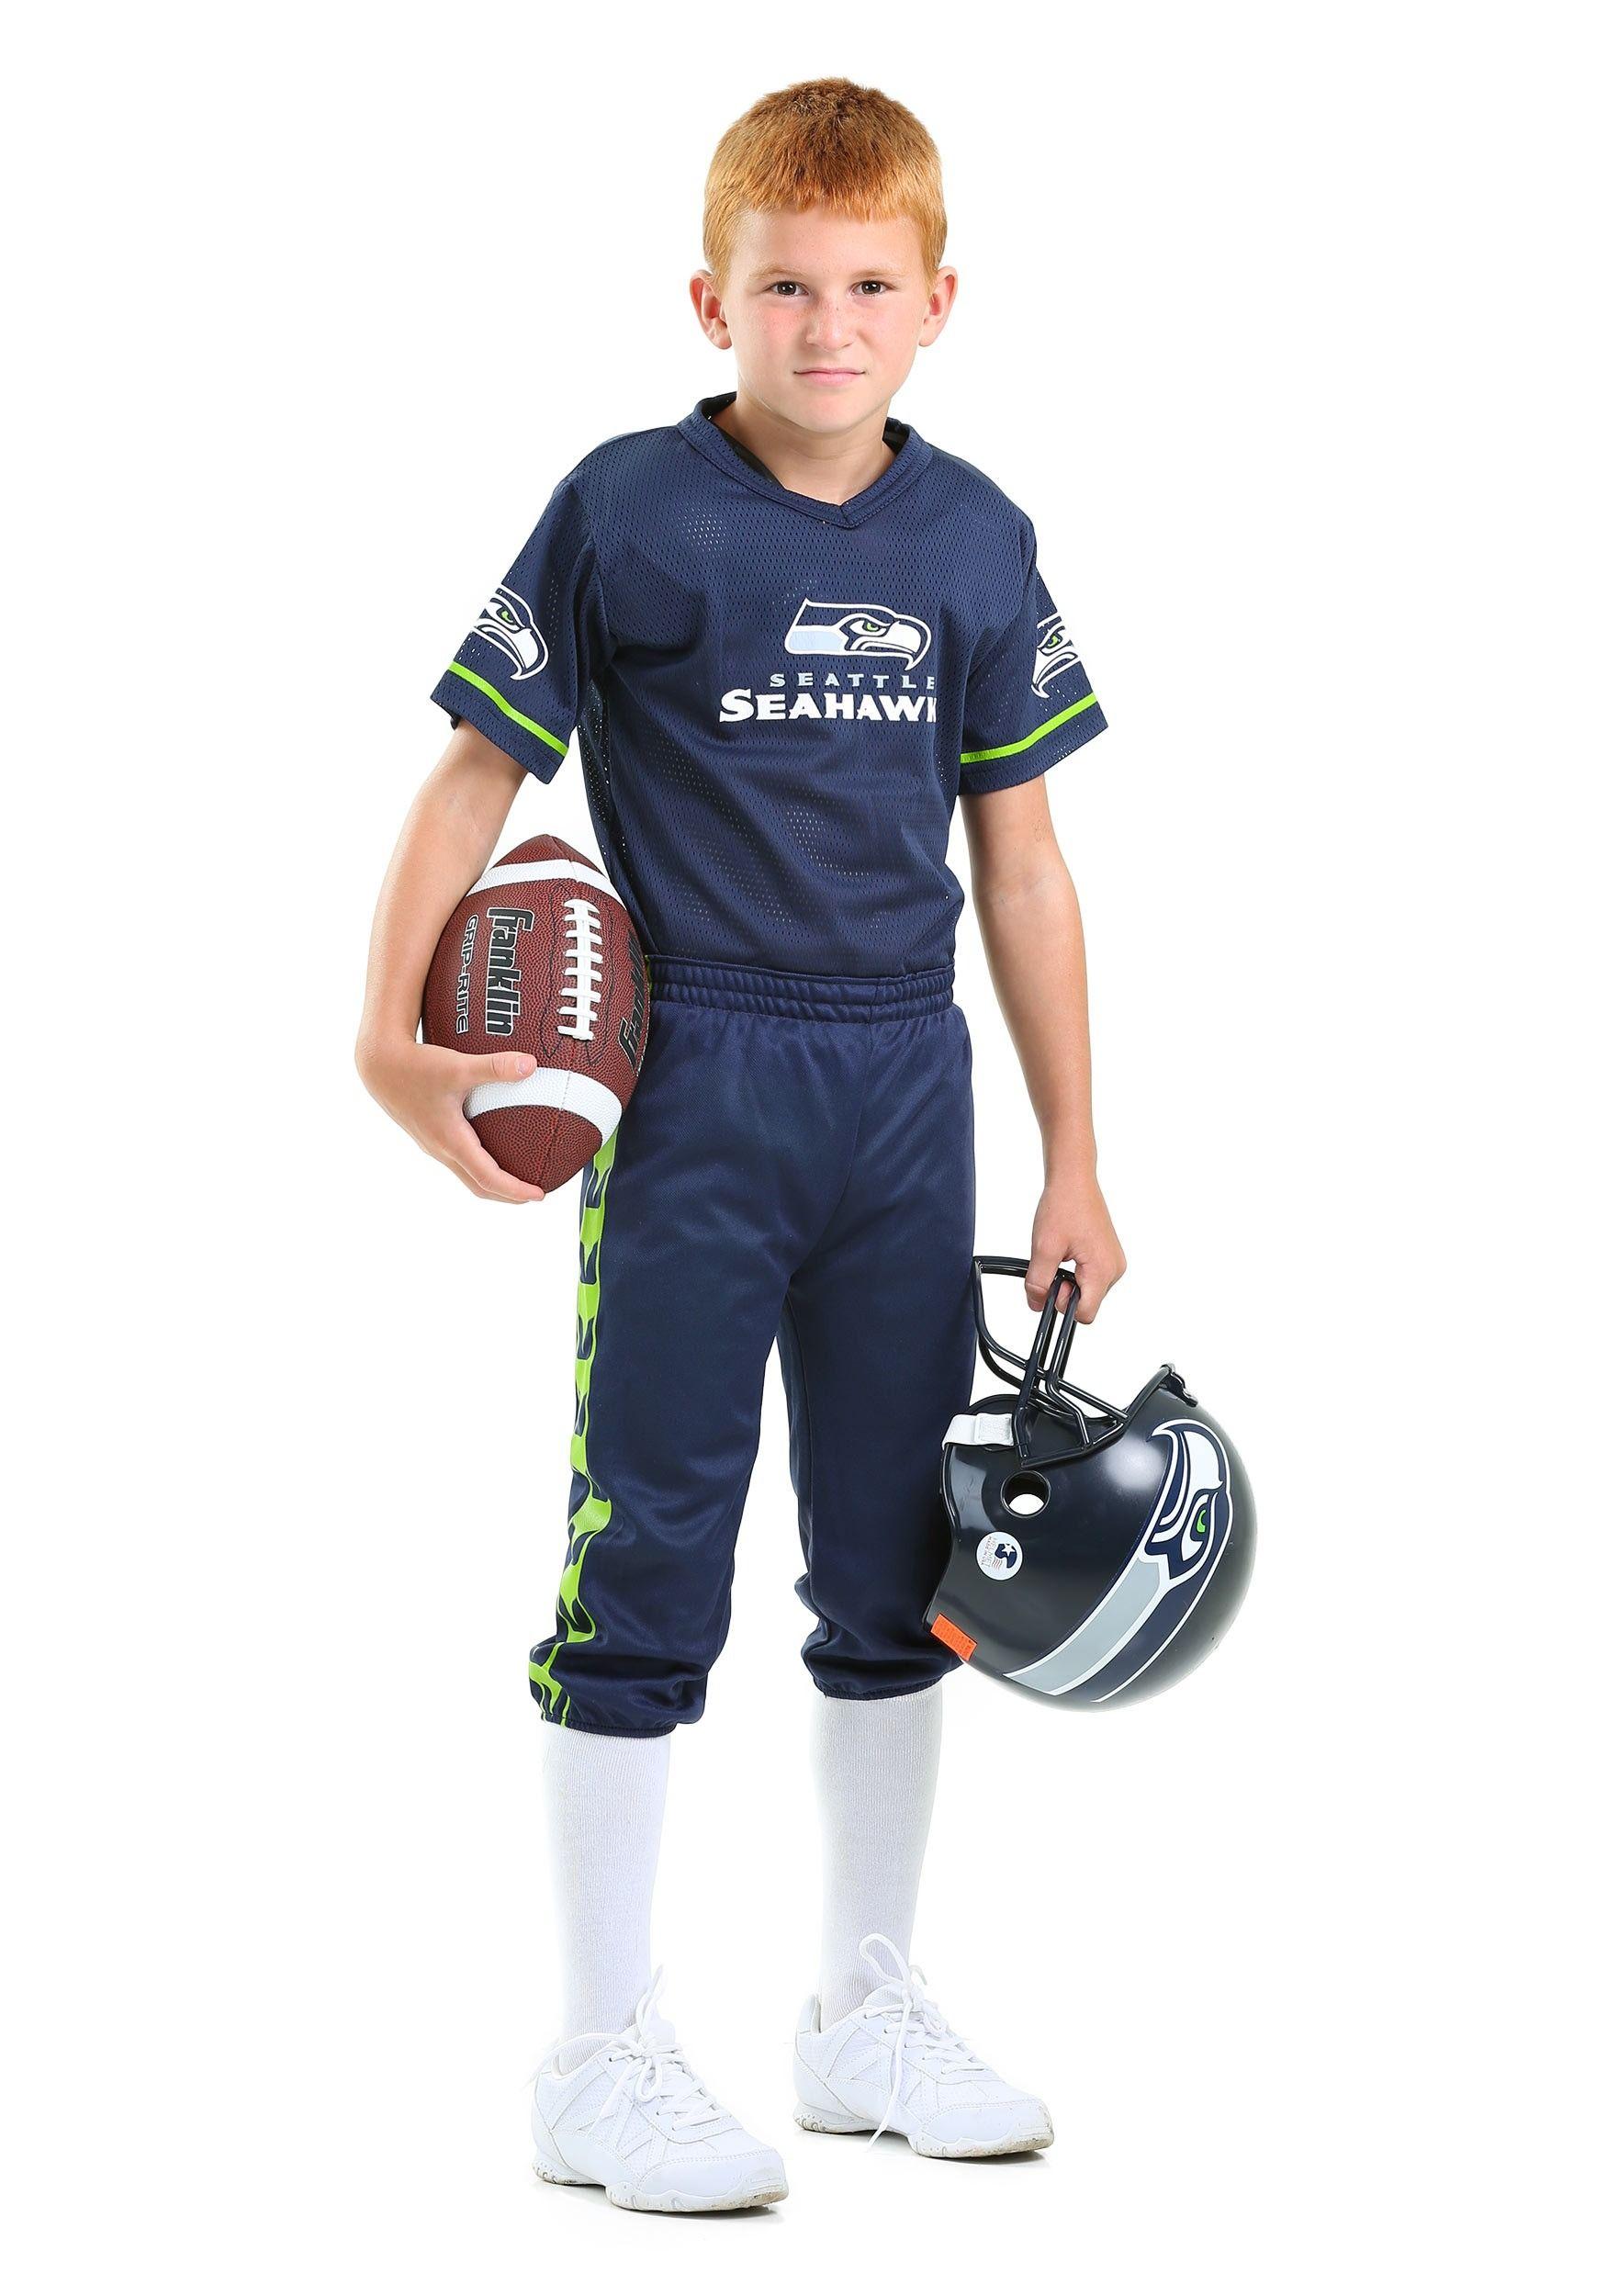 f51ae8b0 NFL Seahawks Uniform Costume   Halloween costumes in 2019   Seahawks ...